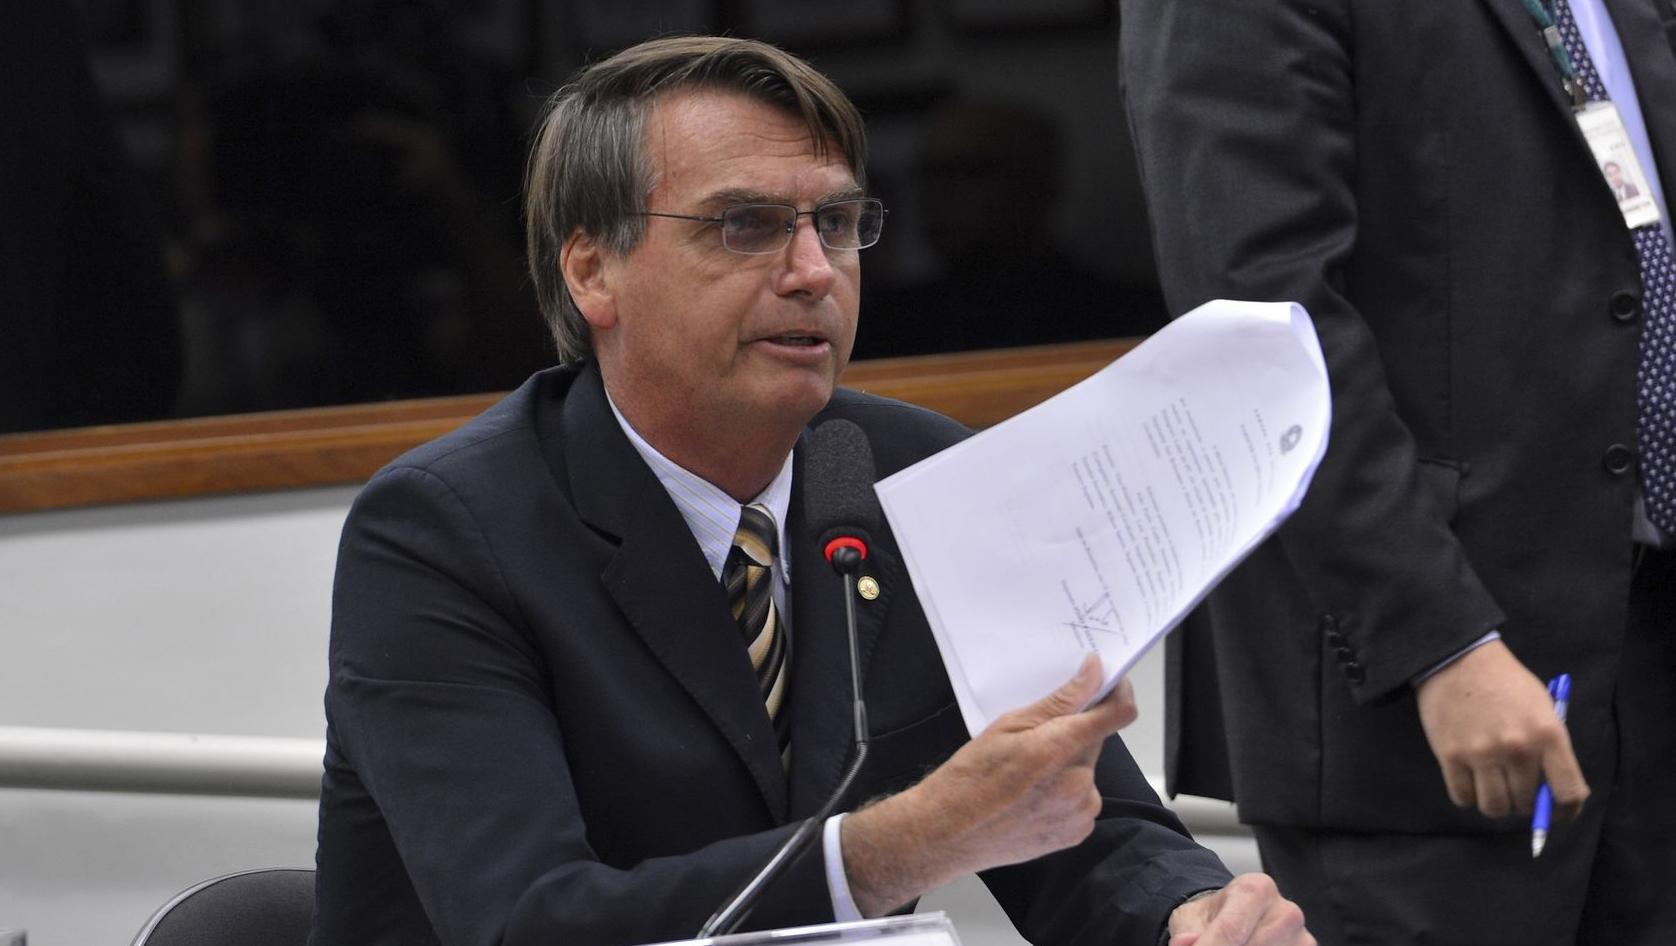 Jair Bolsonaro apresenta pedido de impeachment contra Dilma Rousseff